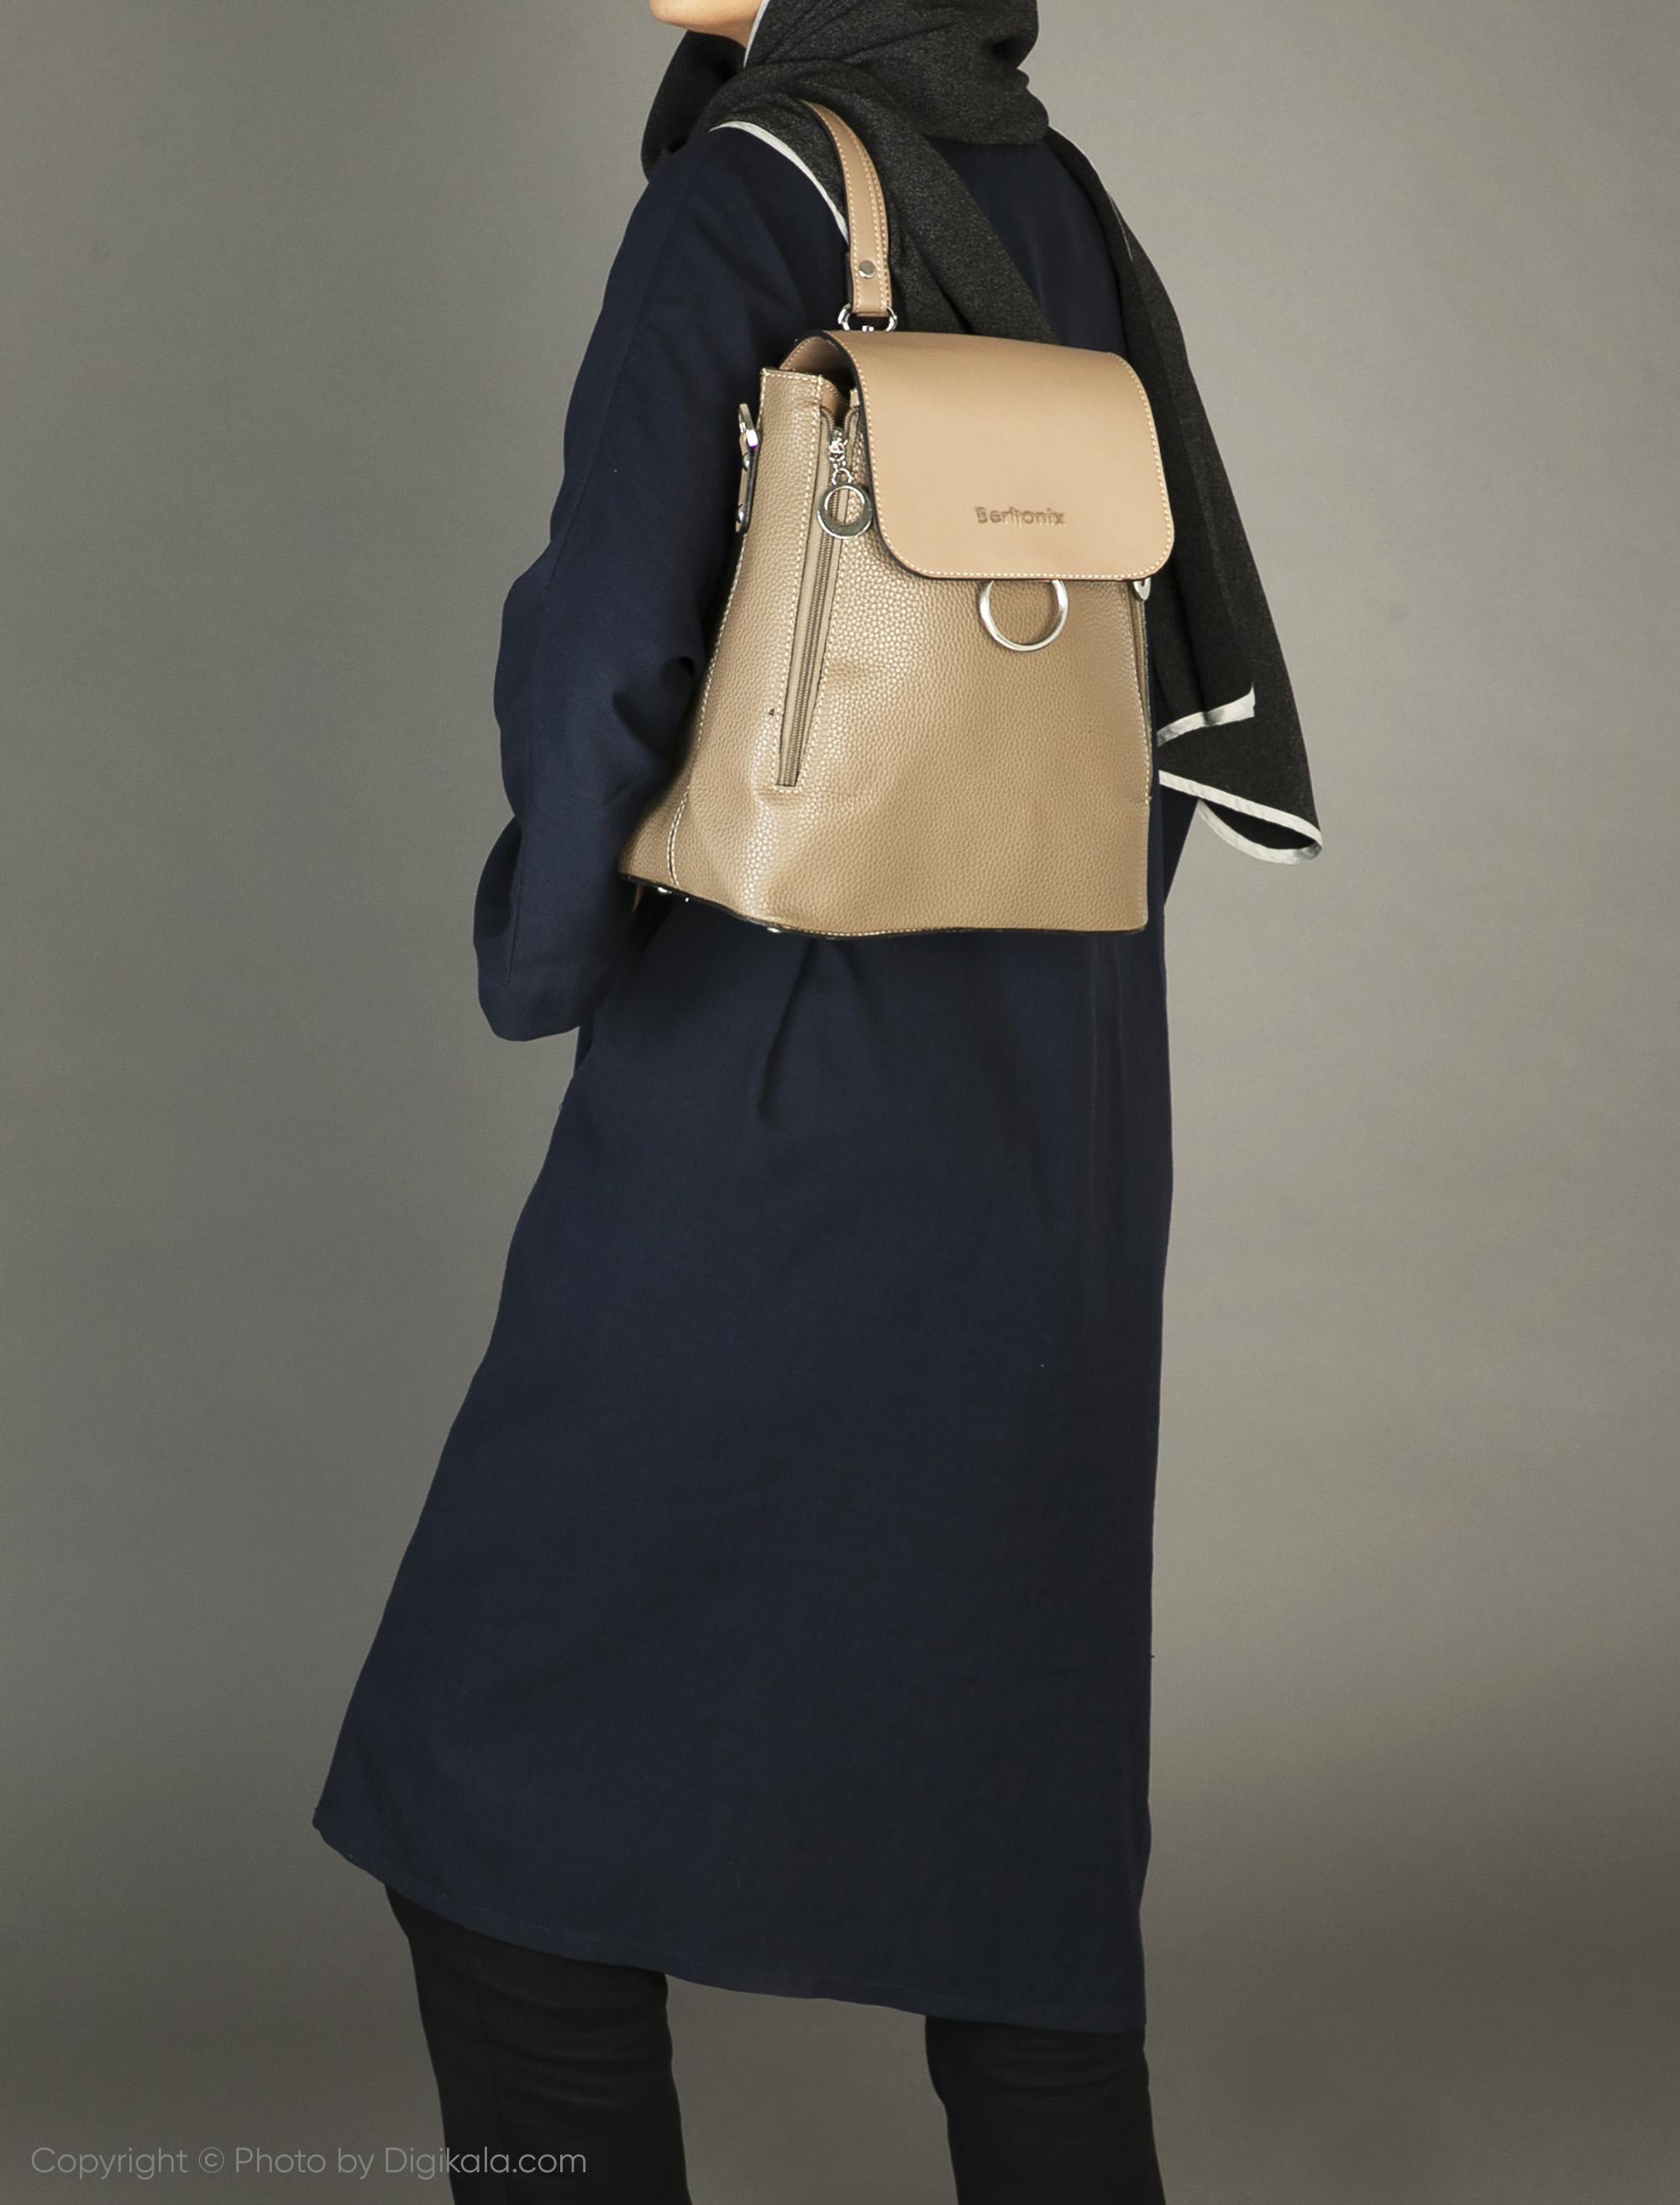 کوله پشتی زنانه برتونیکس مدل B101-30 -  - 4